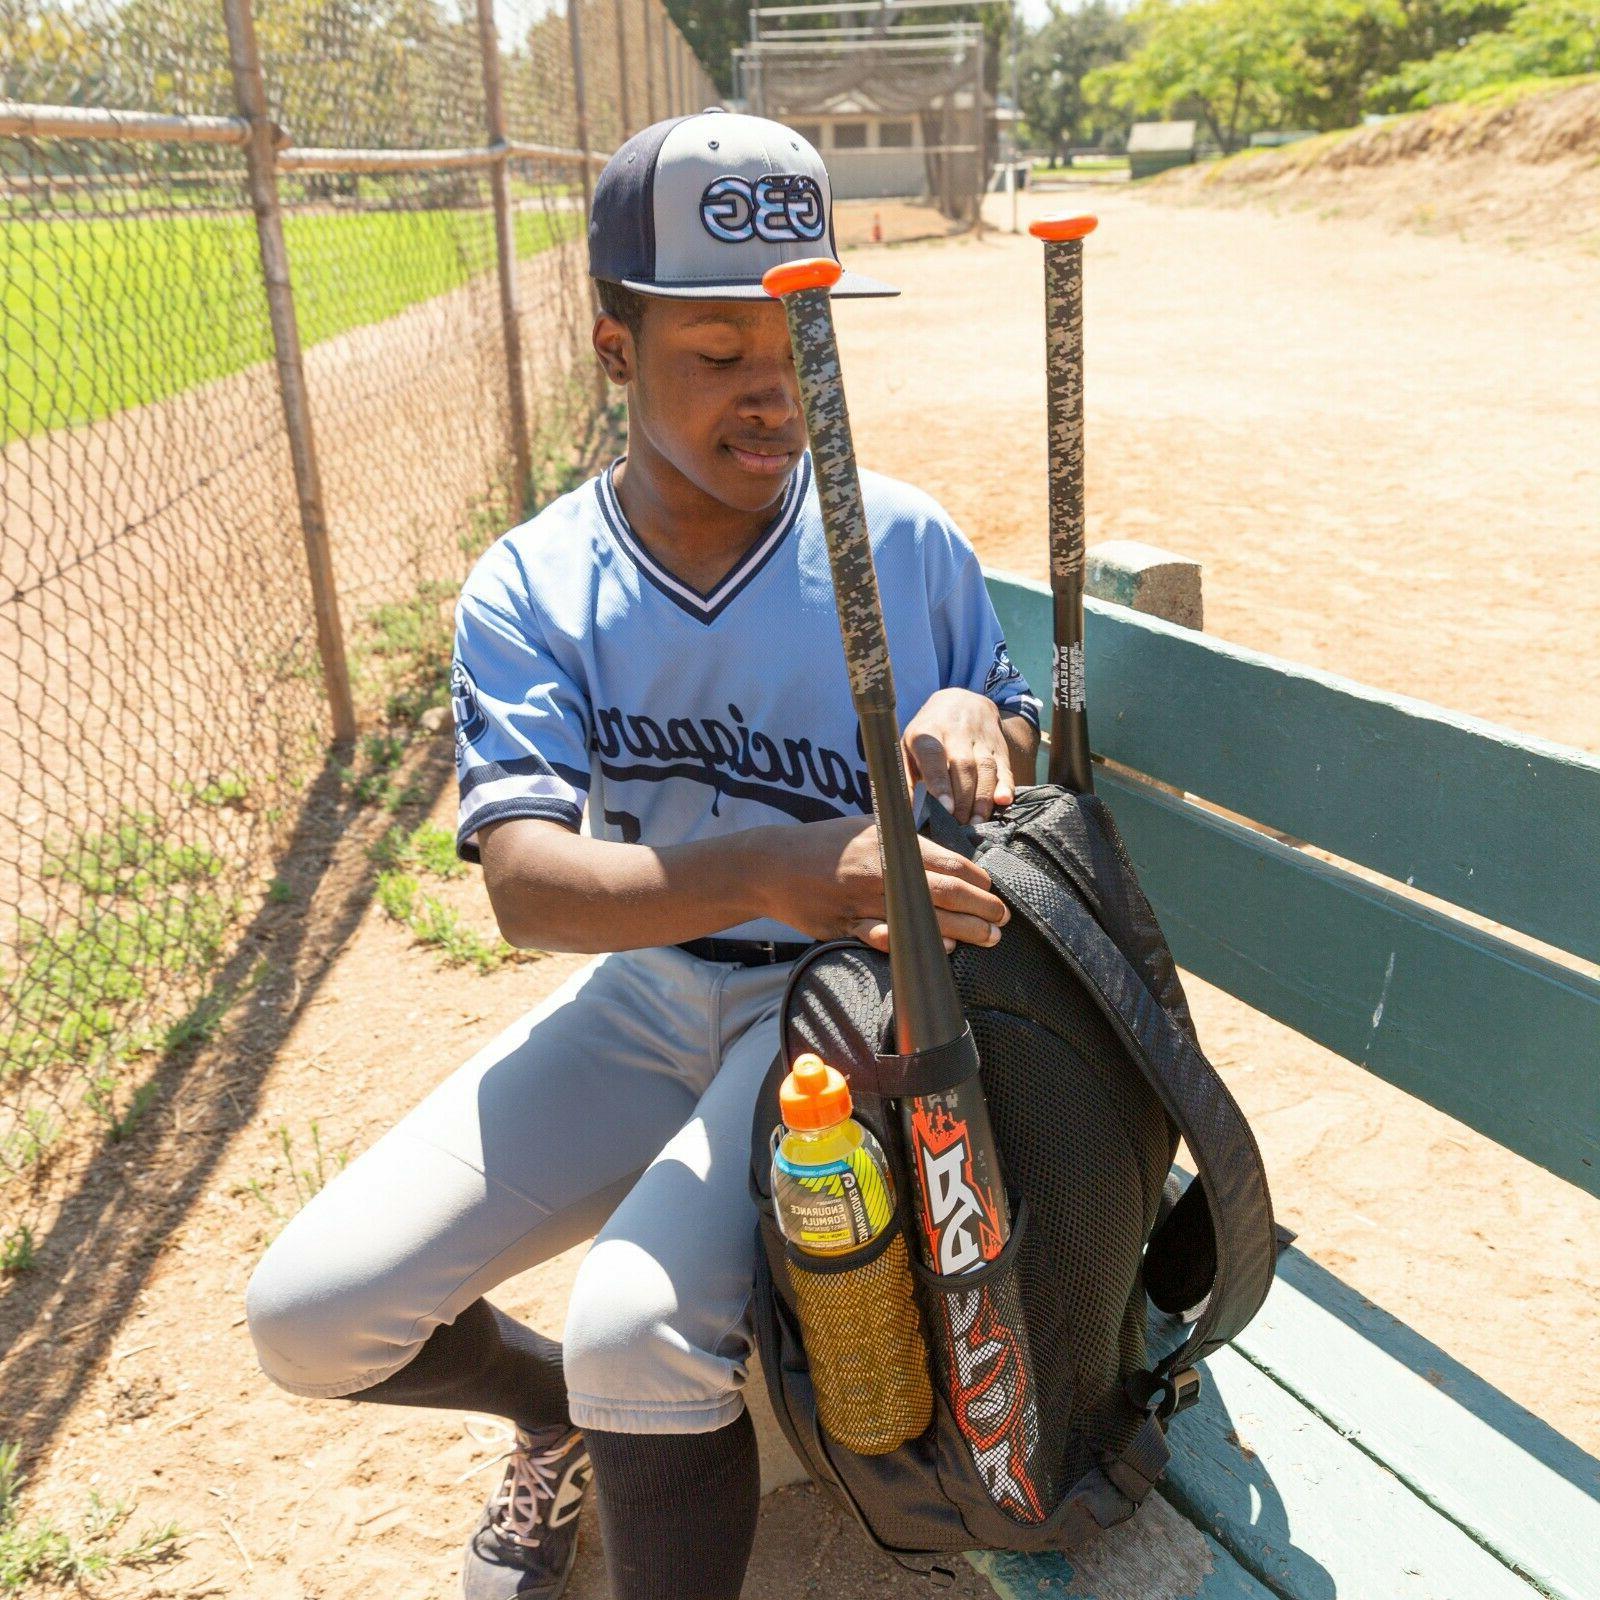 Baseball Backpack Bat   Black Softball Bag Youth